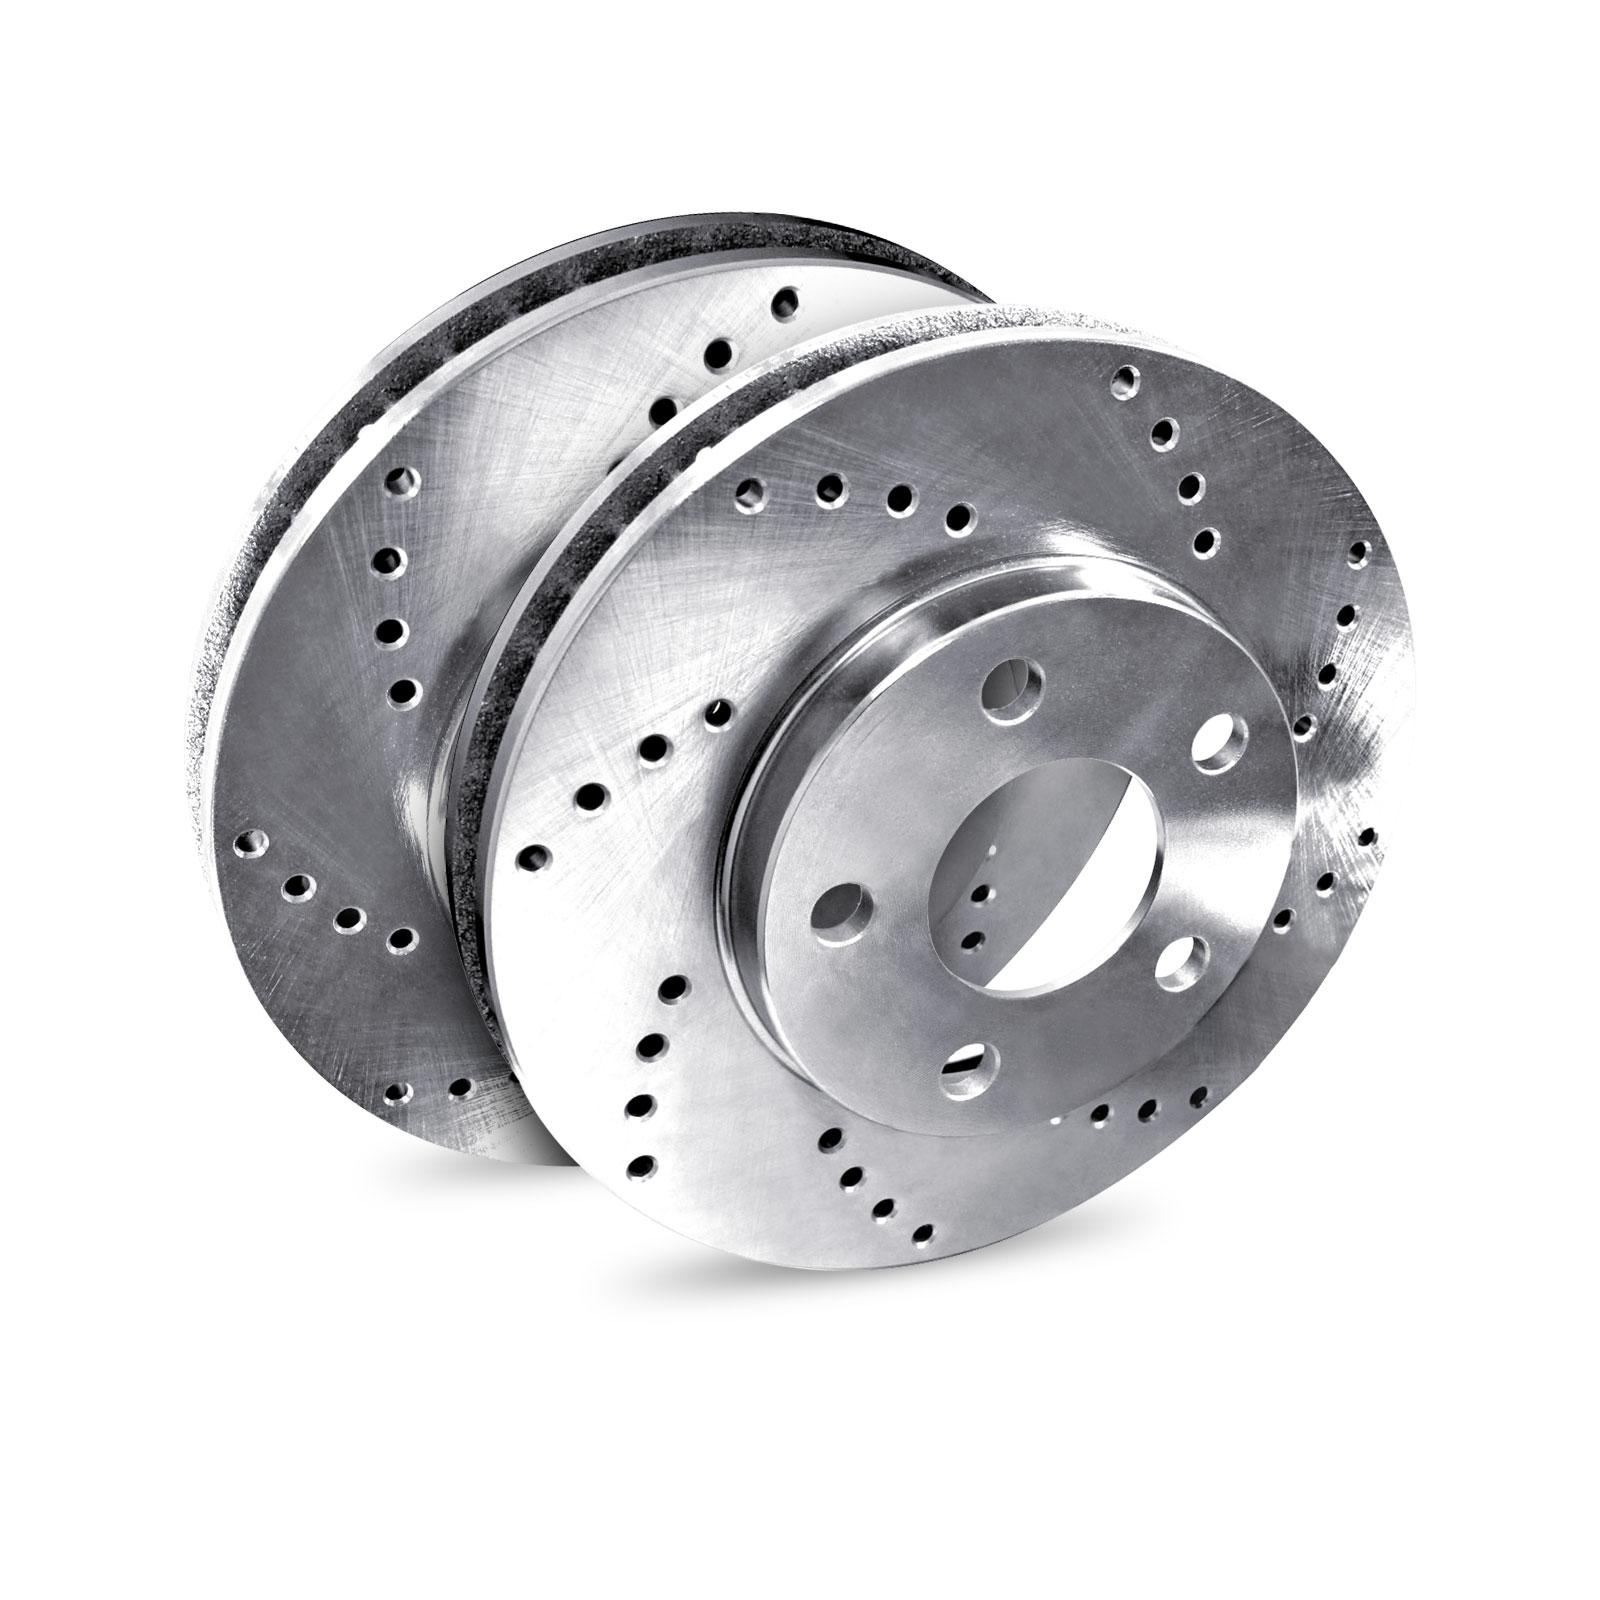 "Brake Rotors 2 REAR ELINE ""CROSS DRILLED"" PERFORMANCE DISC RW46054"